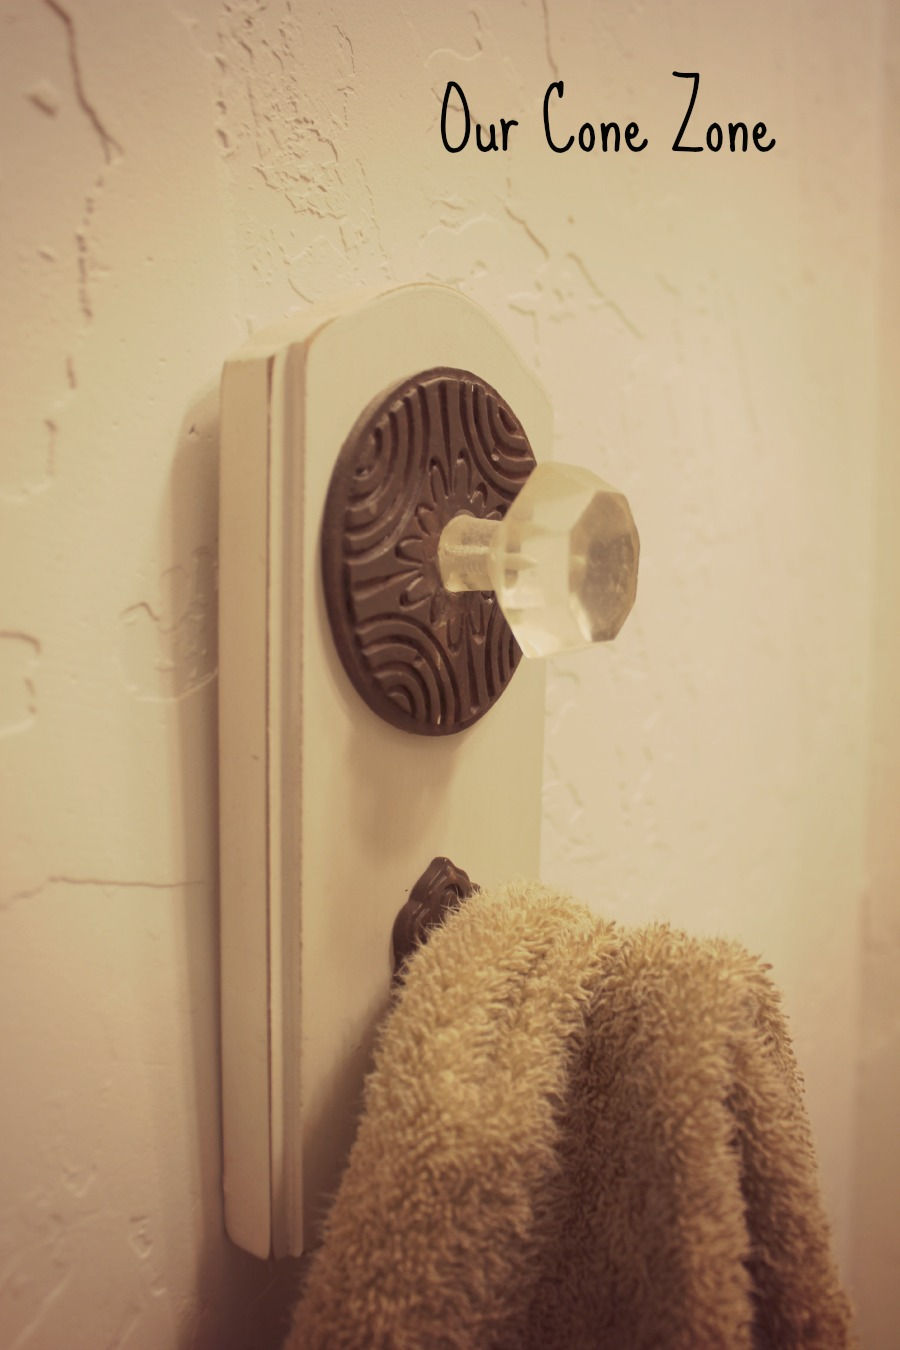 Upstairs Bathroom doorknob for towel